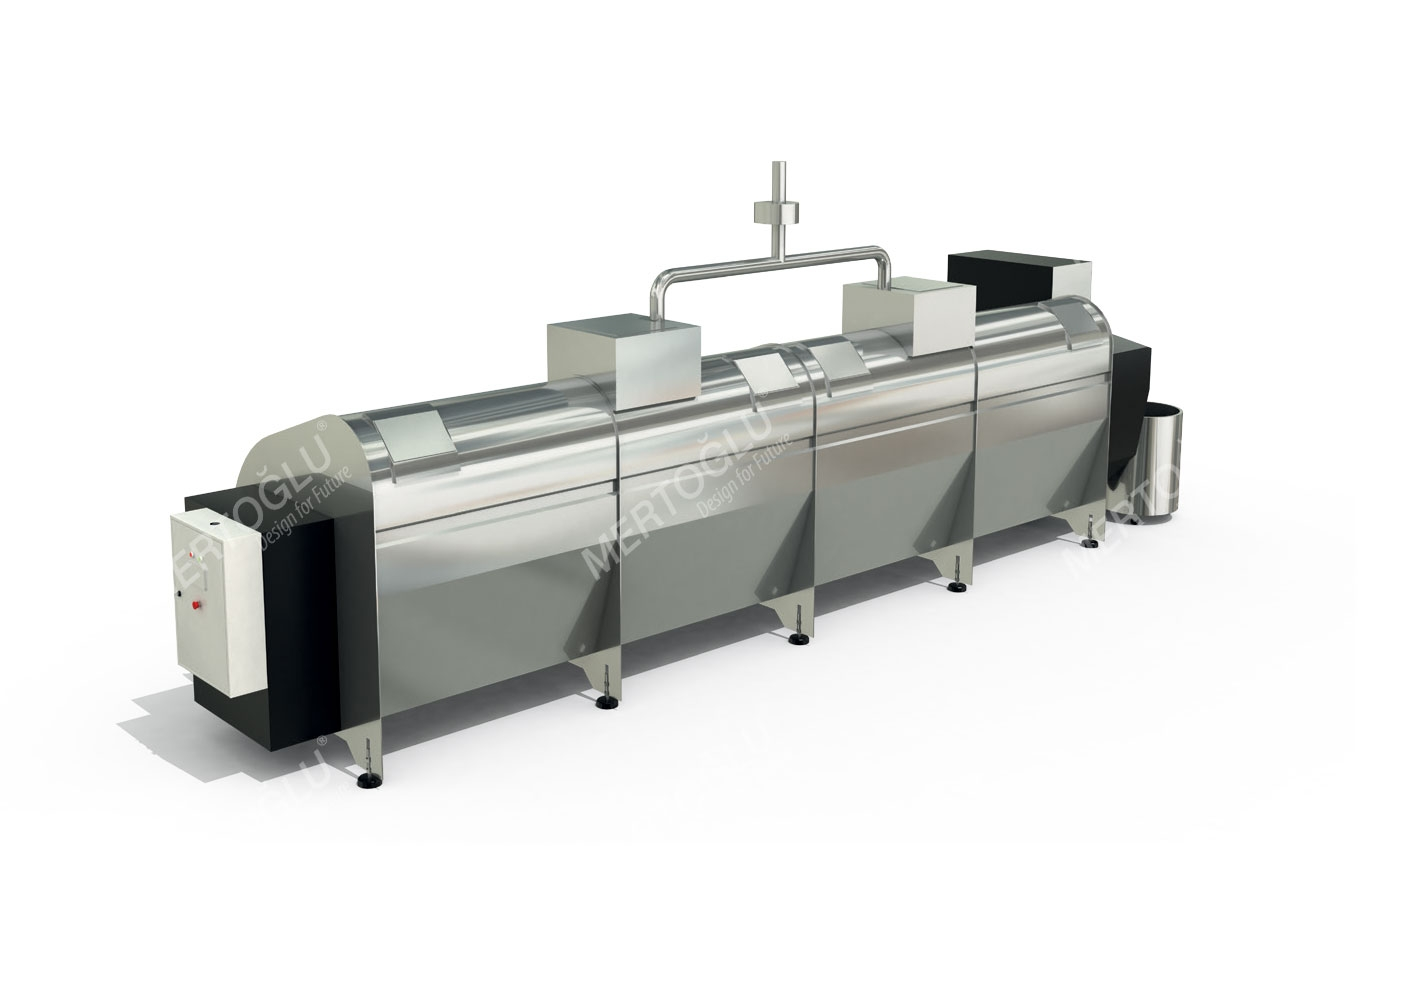 Sıfır Kayıp Projesi Kompost Makinası Msa-103a